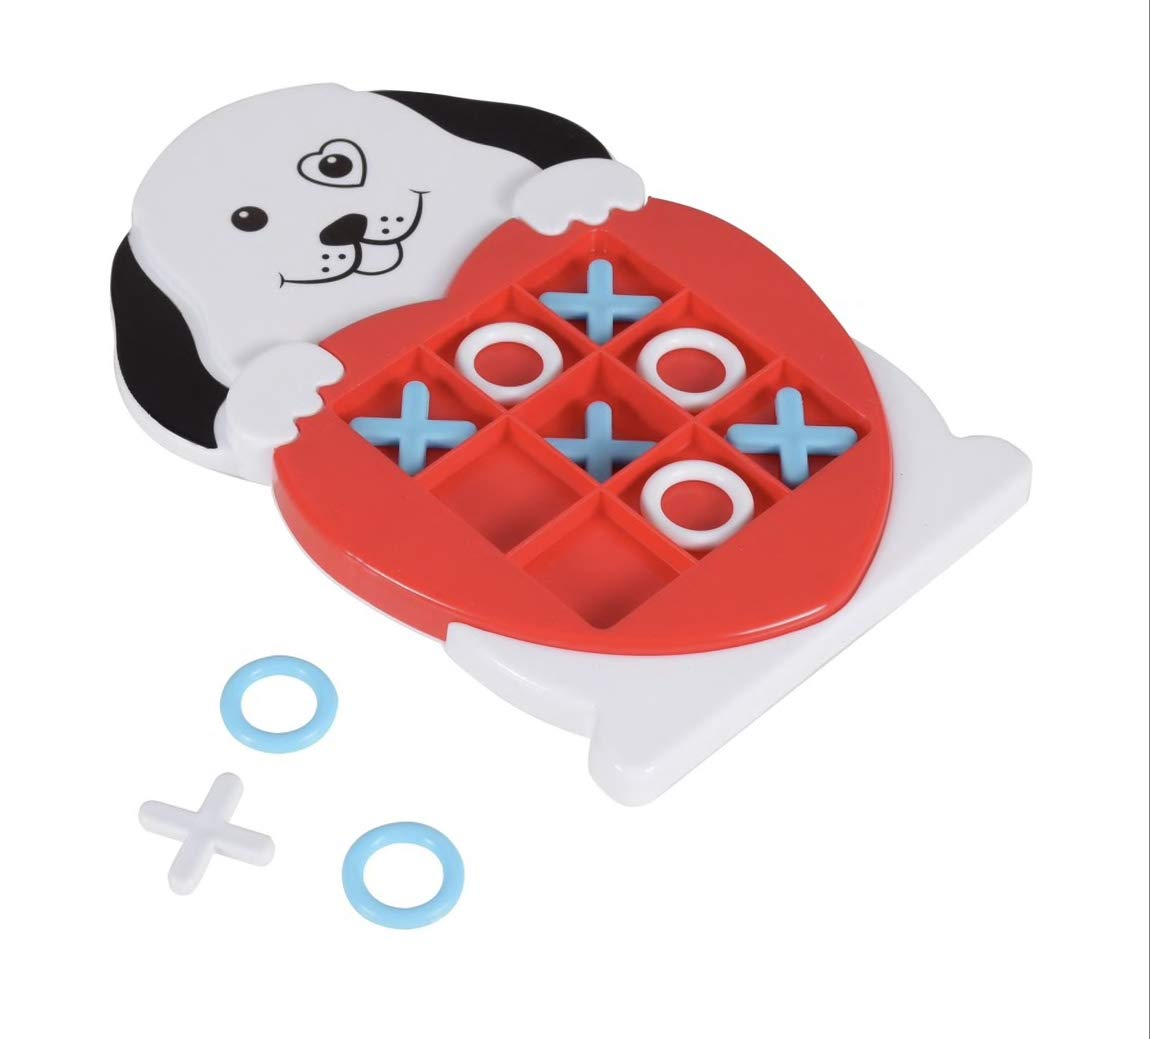 Dog /& Bear Valentines 2 Piece Plastic Animal Tic Tac Toe Games Greenbrier International